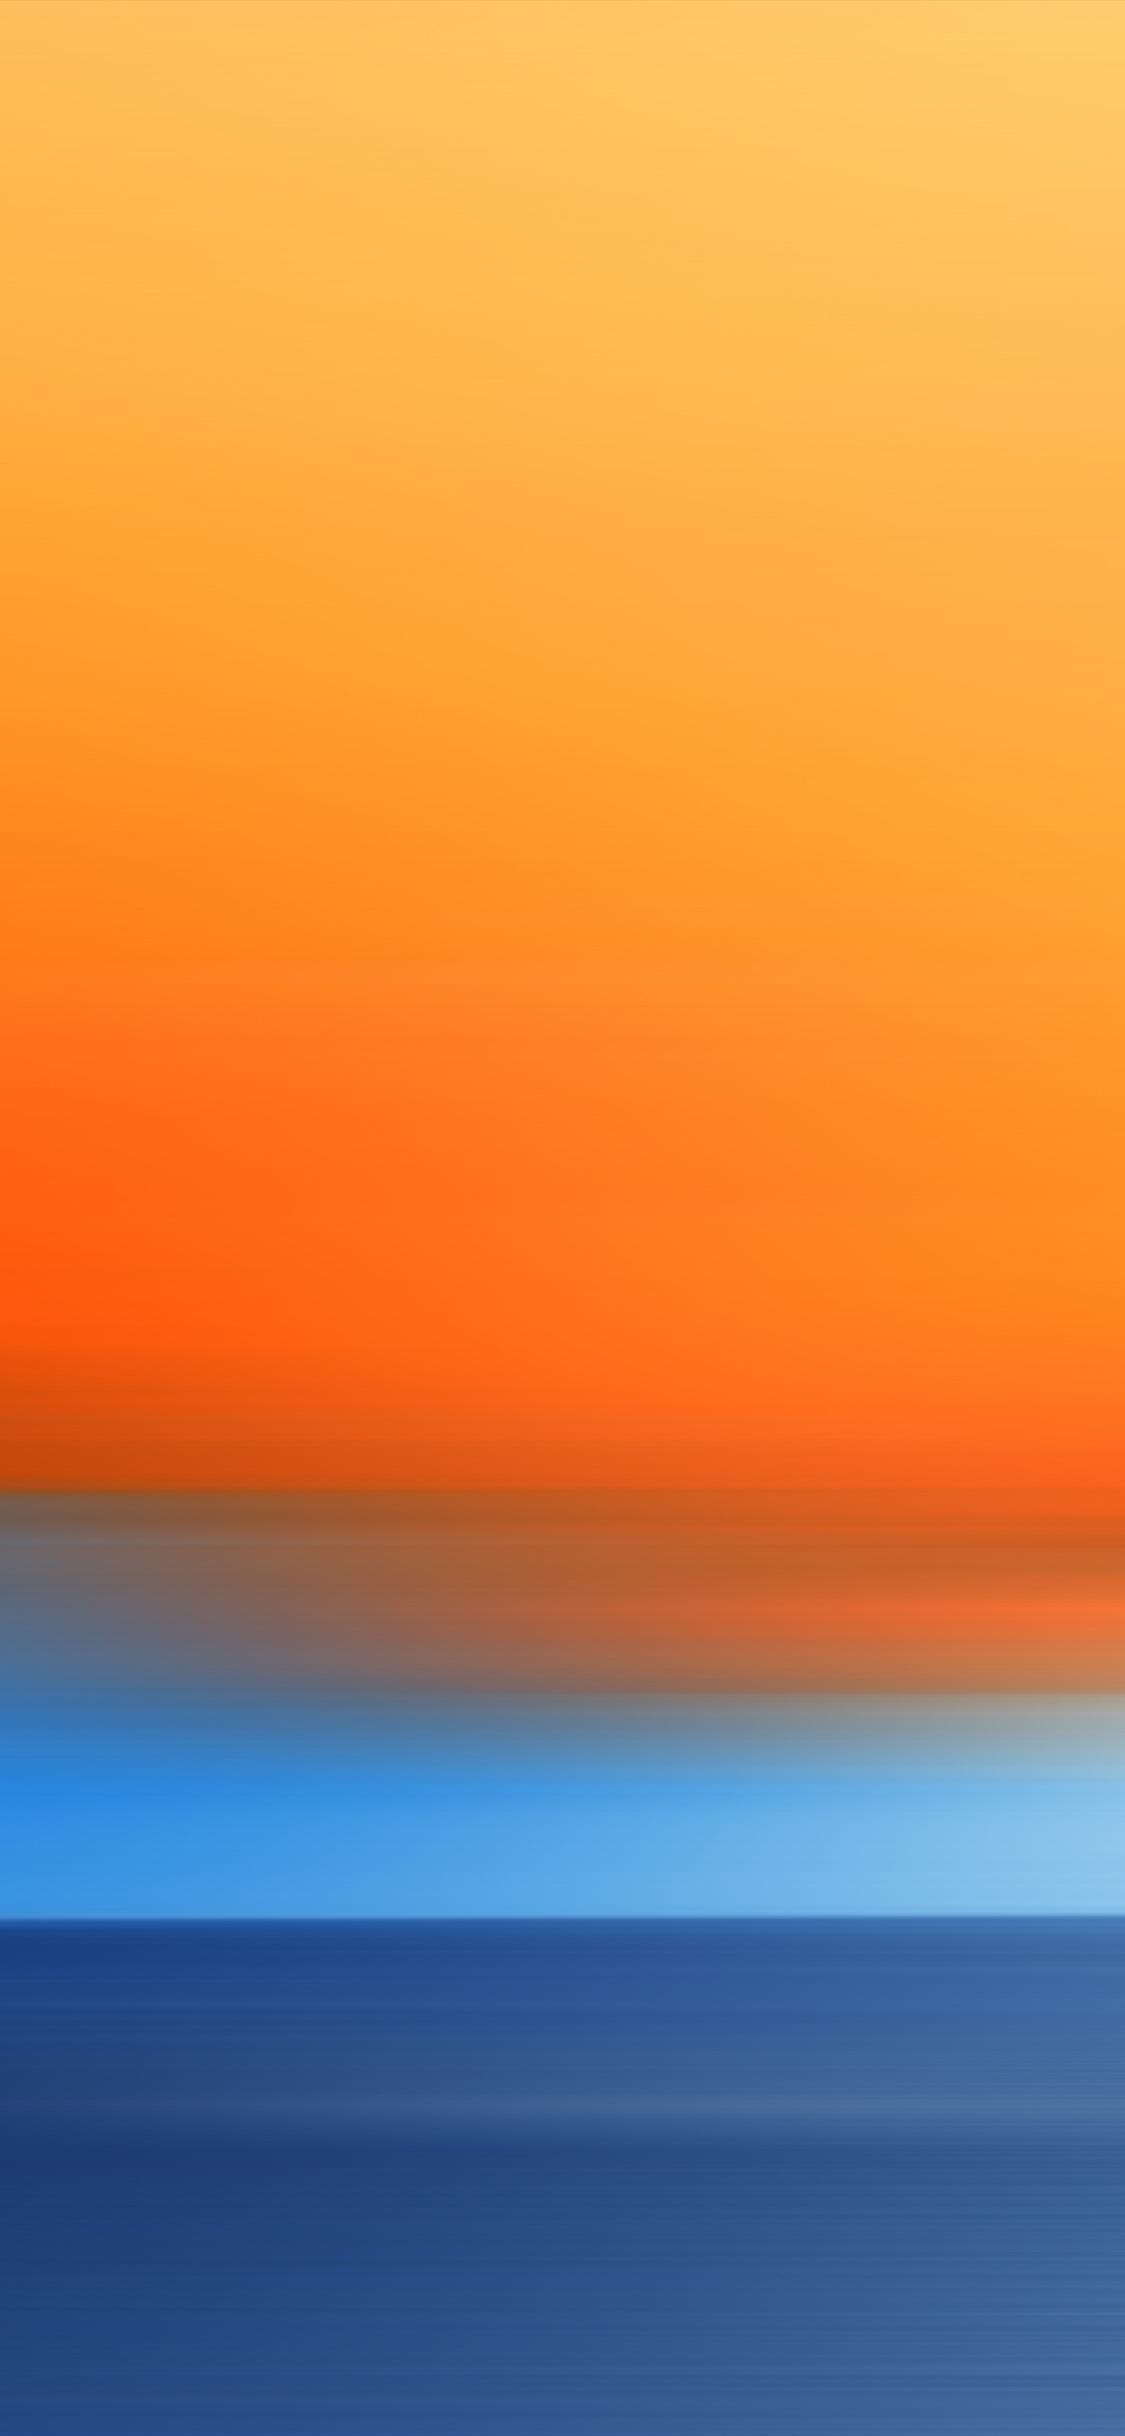 iPhoneXpapers.com-Apple-iPhone-wallpaper-sk40-motion-orange-blur-gradation